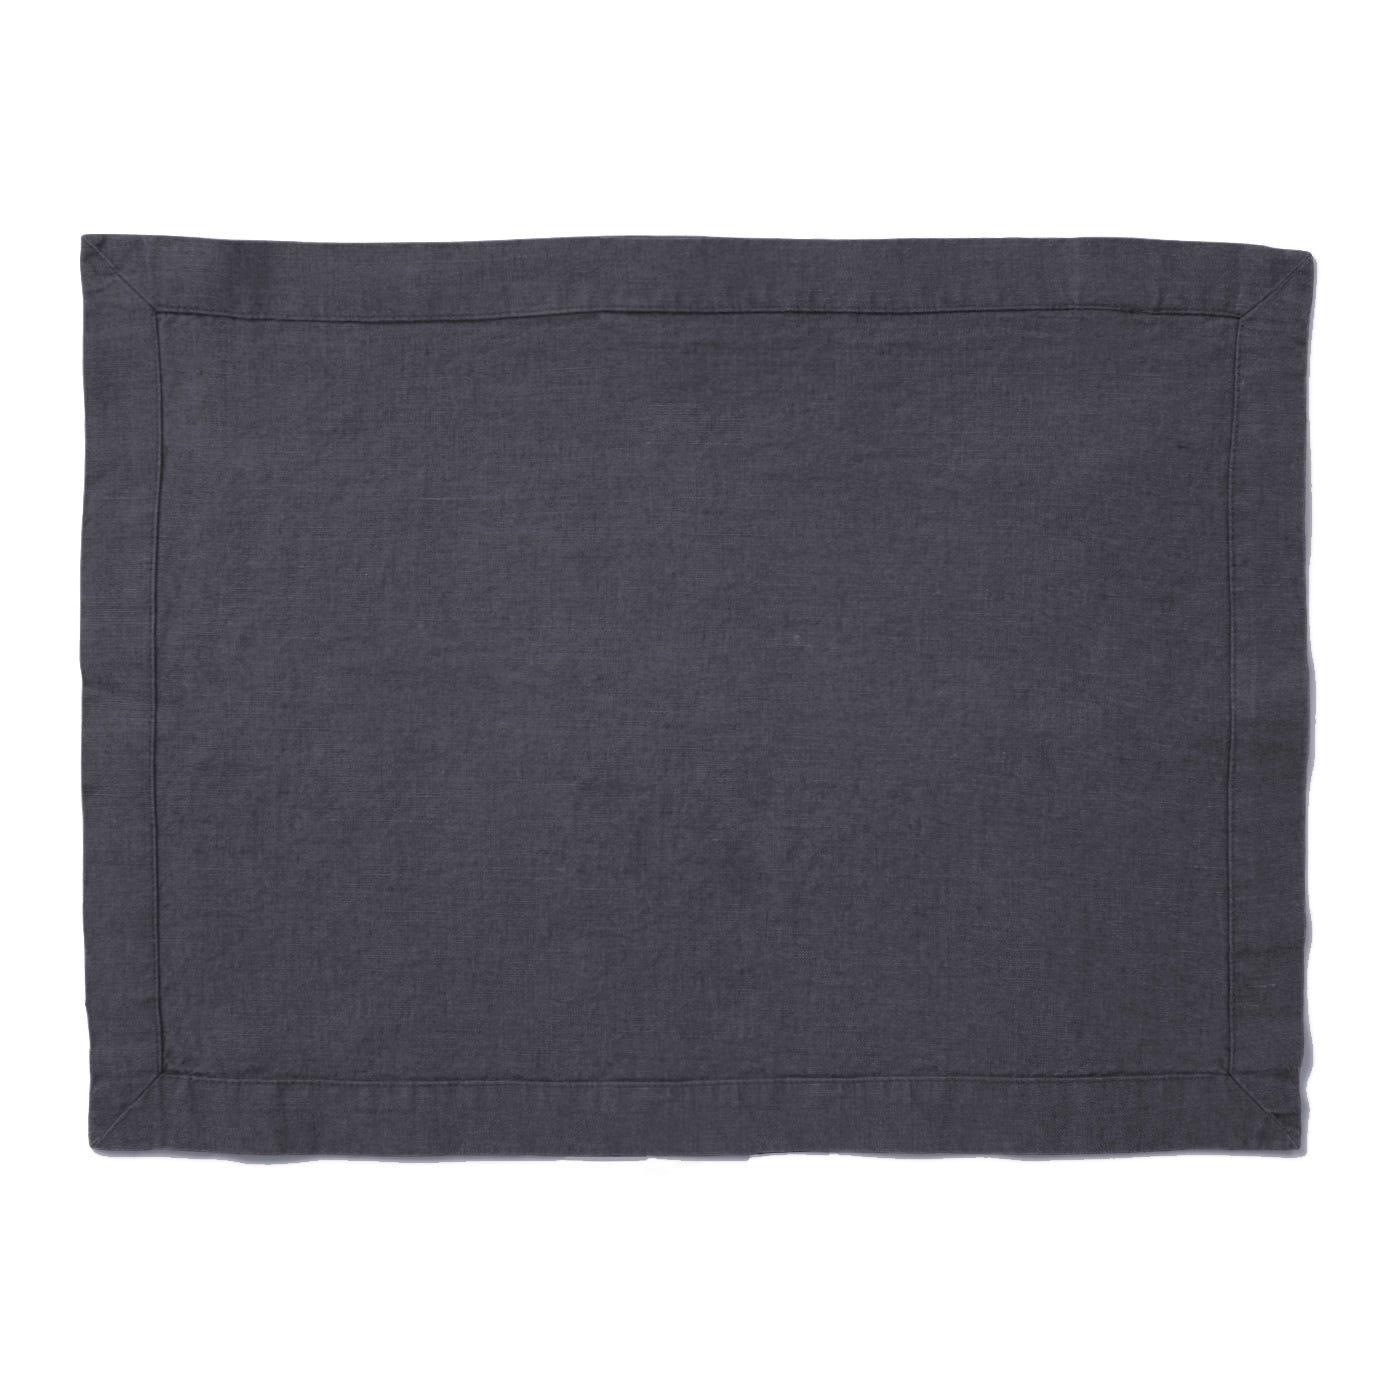 Heal's Linen Placemat Slate